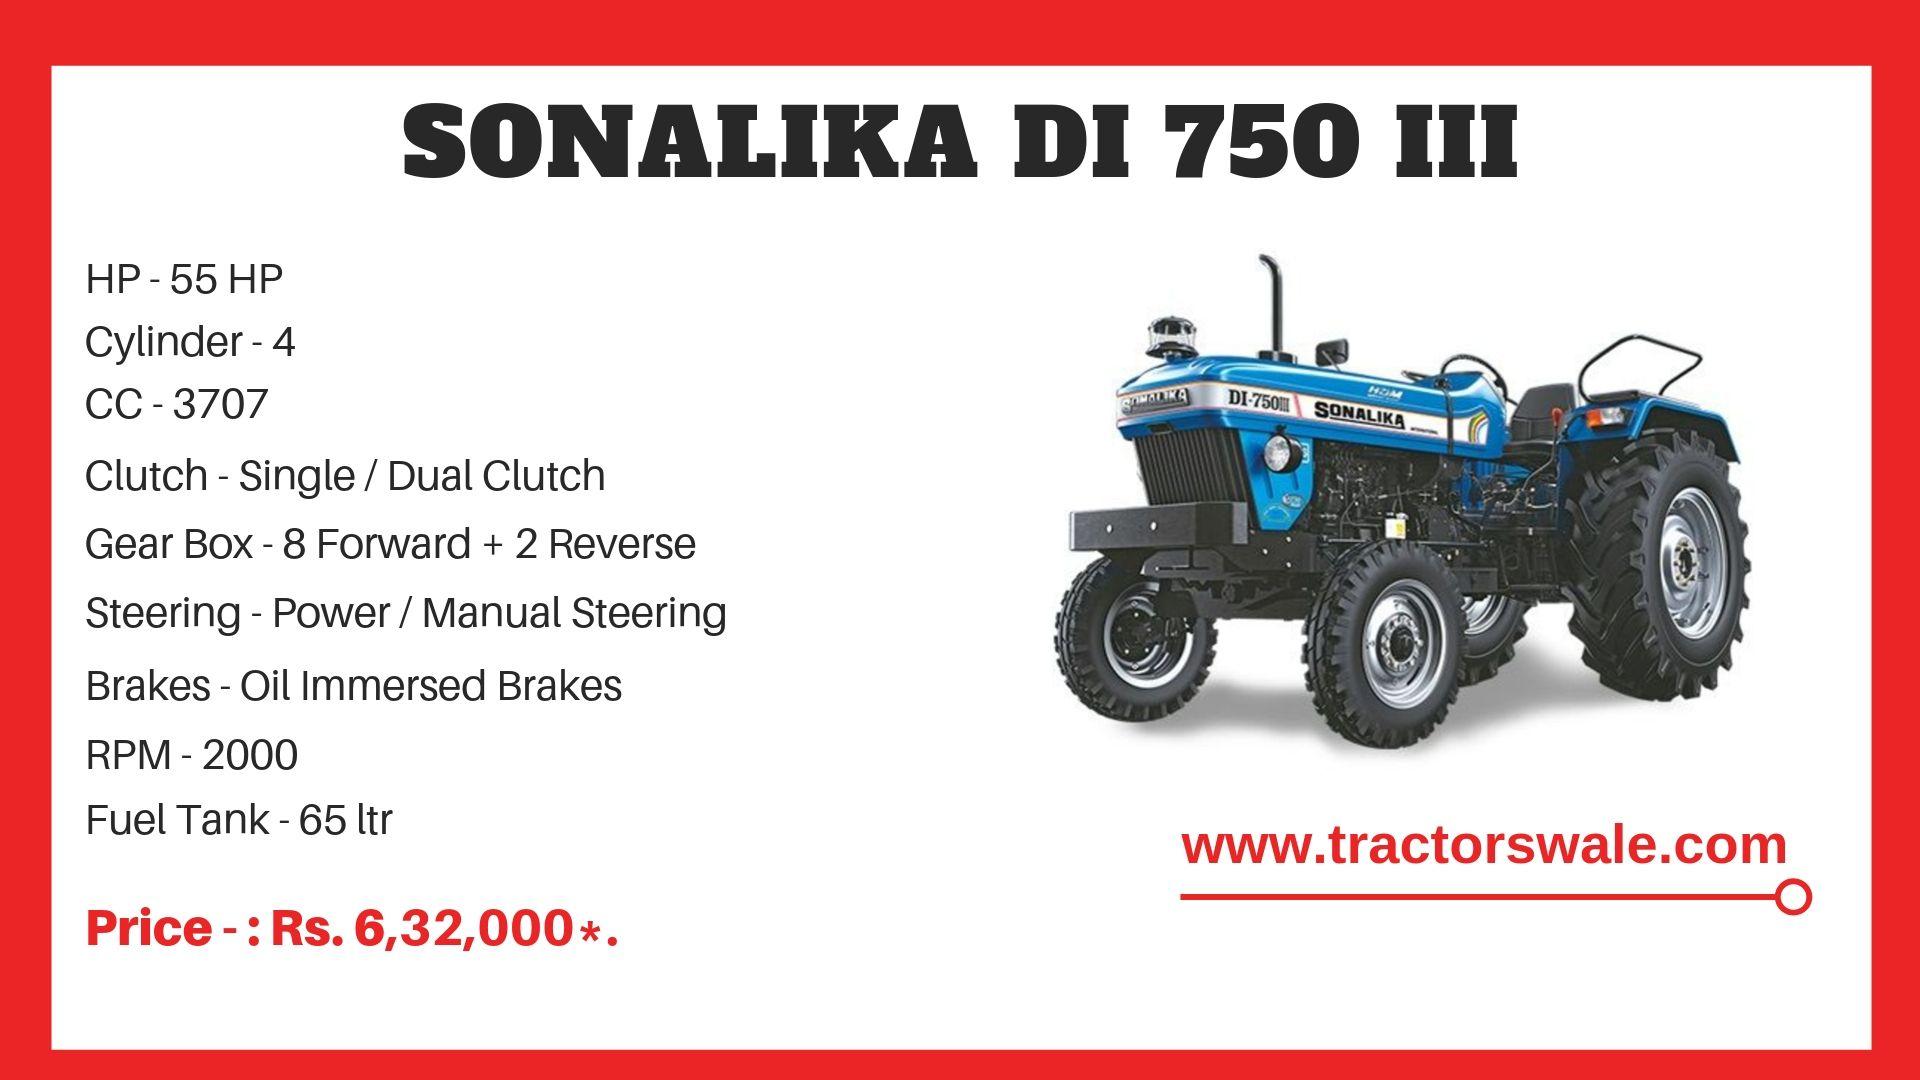 Sonalika DI 750 III Tractor specs